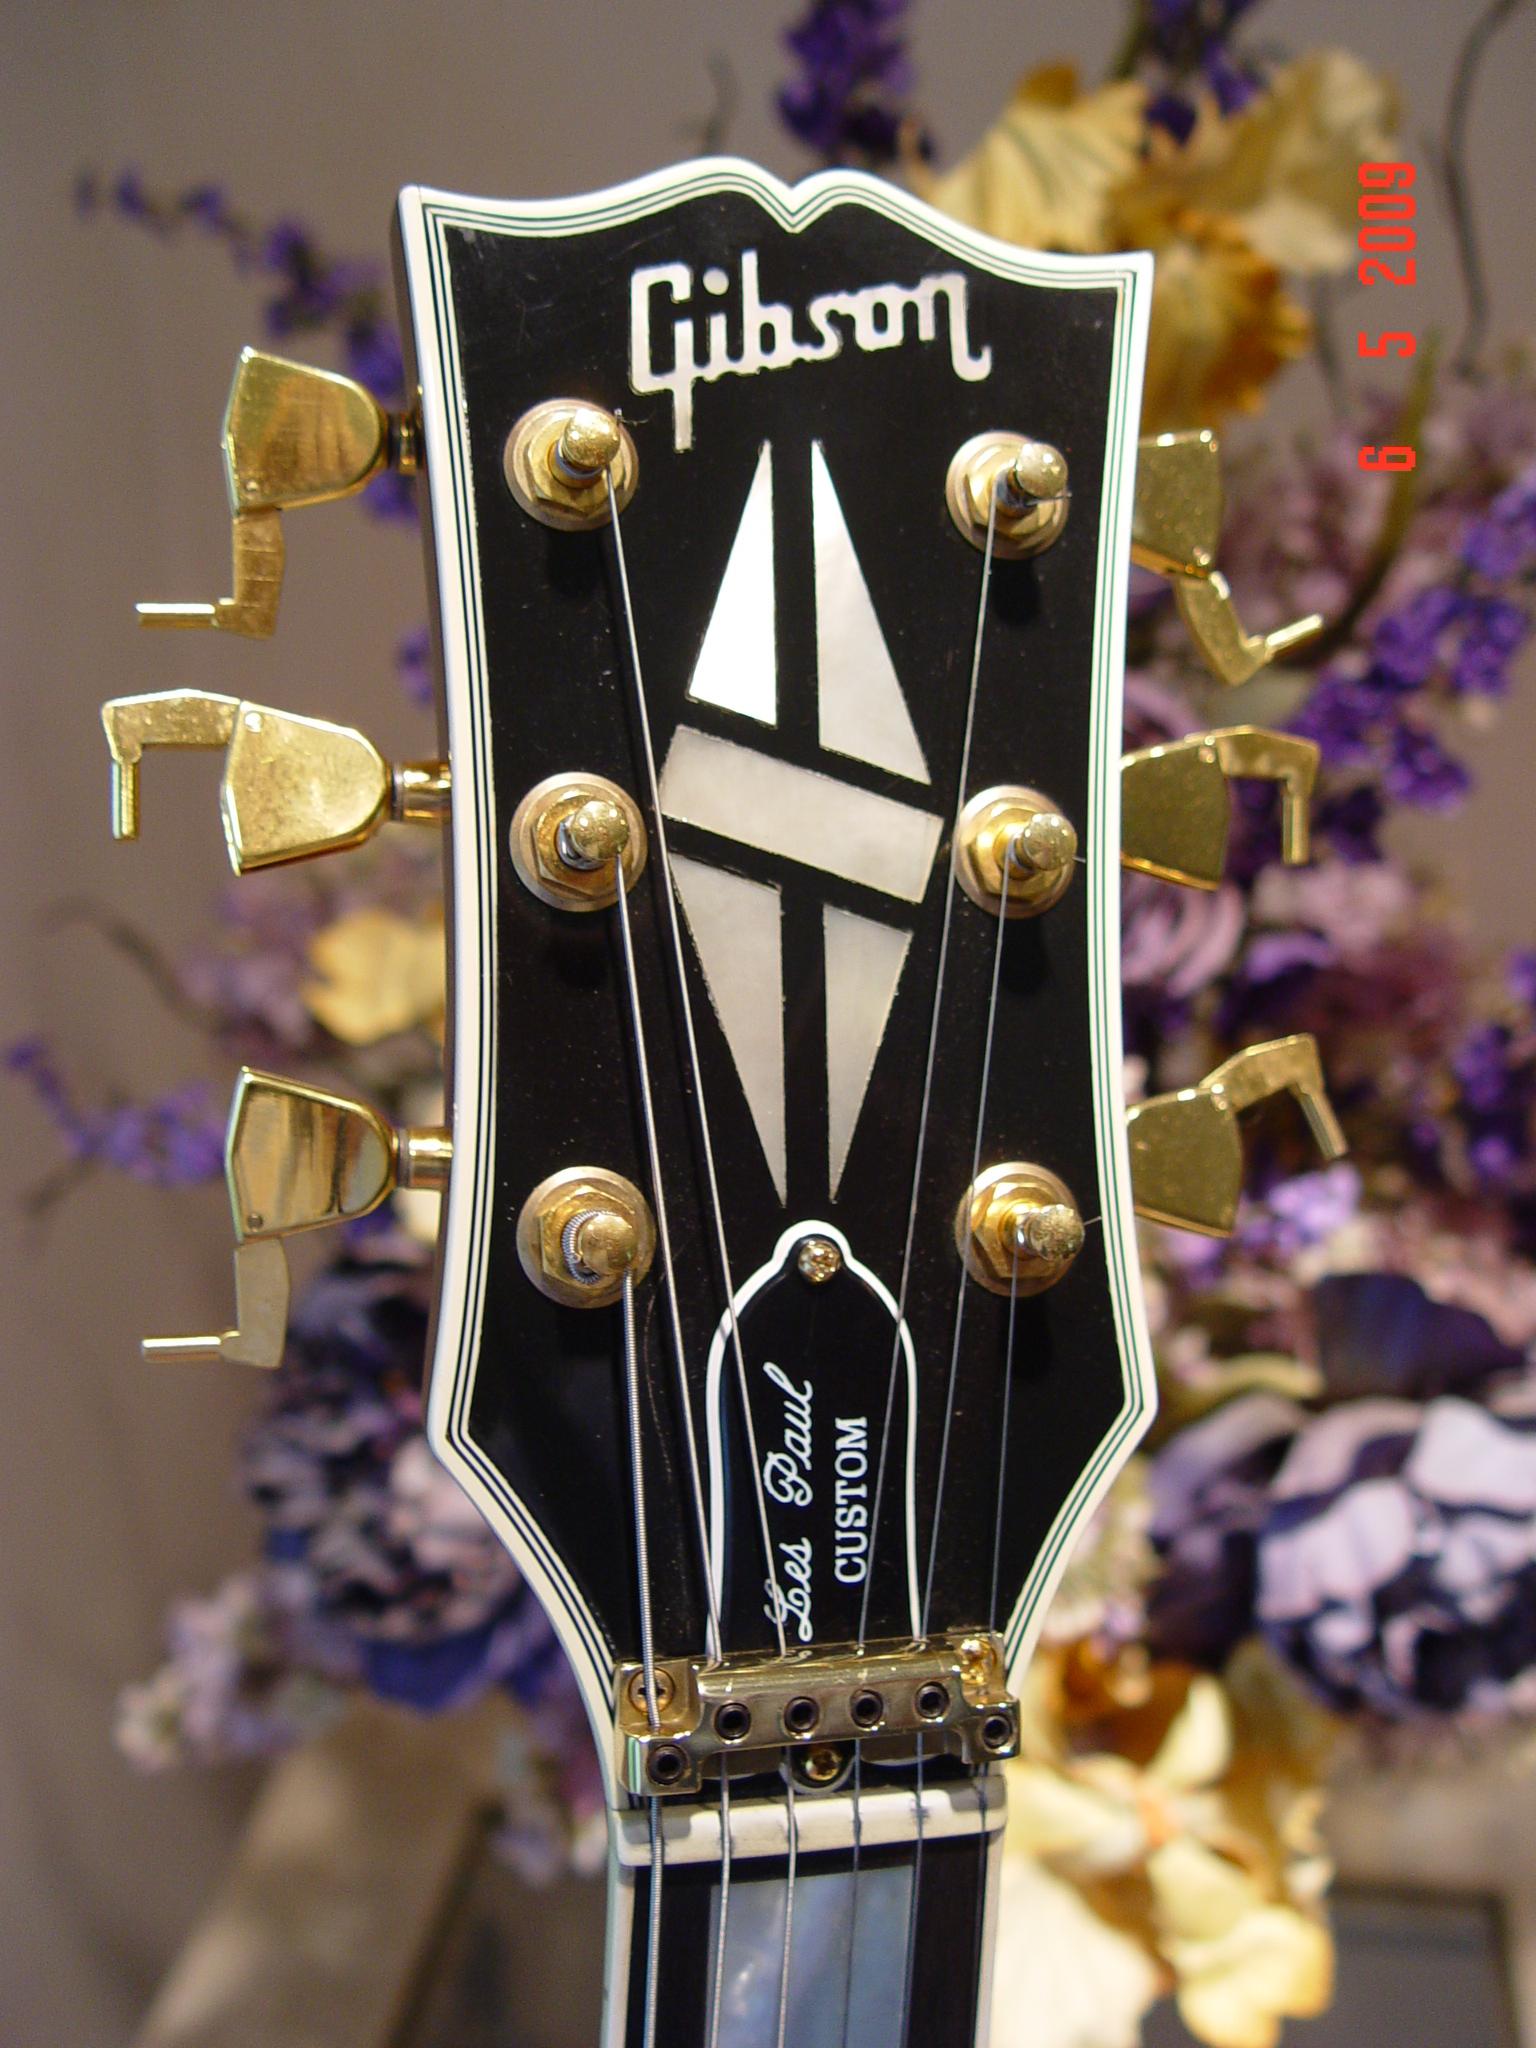 1983 Gibson Les Paul Custom Tulip Tuners Headstock Guitarwacky.com